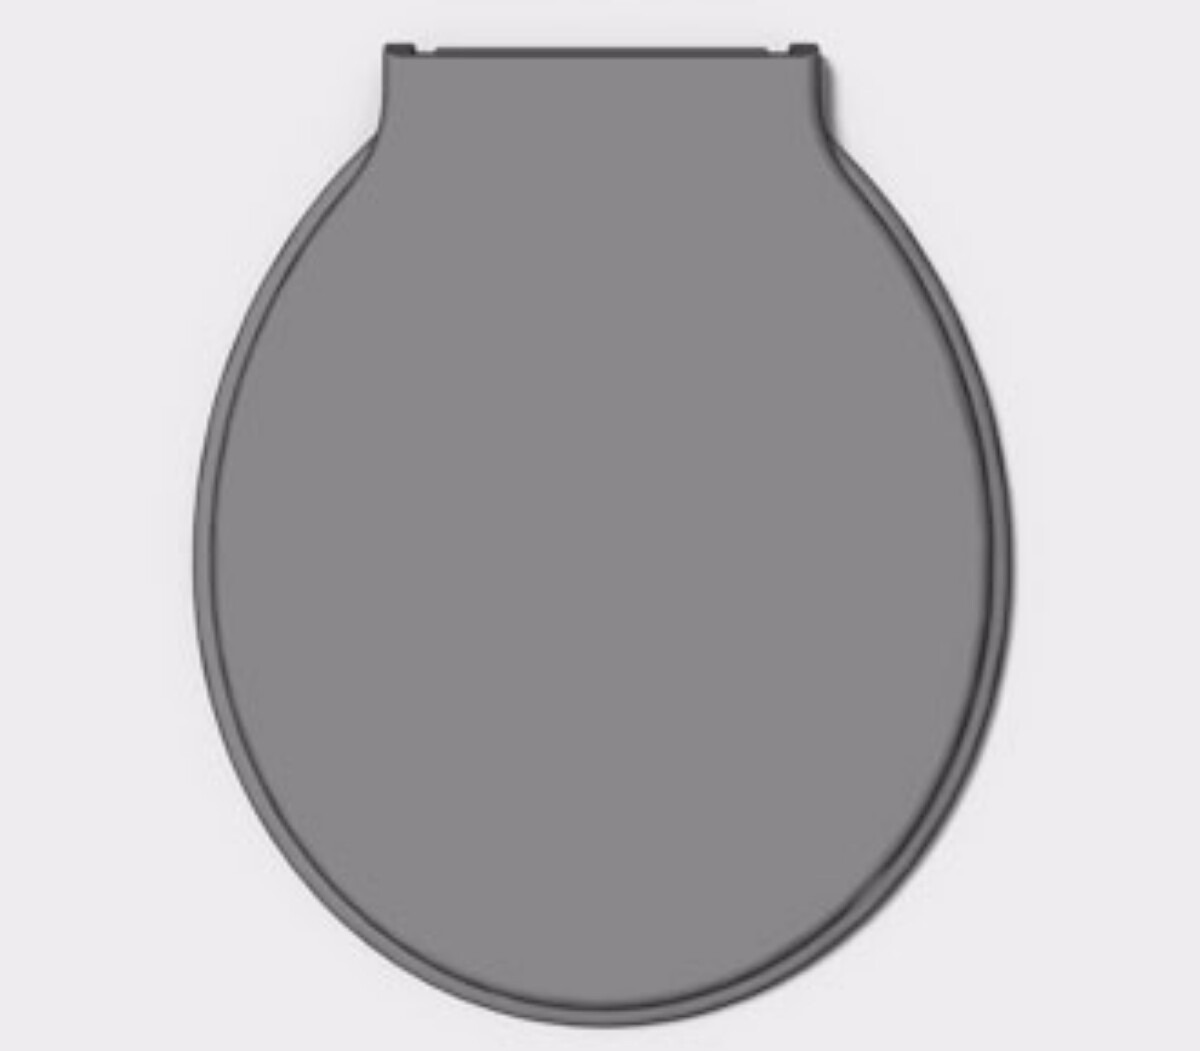 Plástico Cinza / Tampa Bacia Vaso Banheiro R$ 19 93 no MercadoLivre #685D6E 1200x1051 Banheiro Com Vaso Cinza